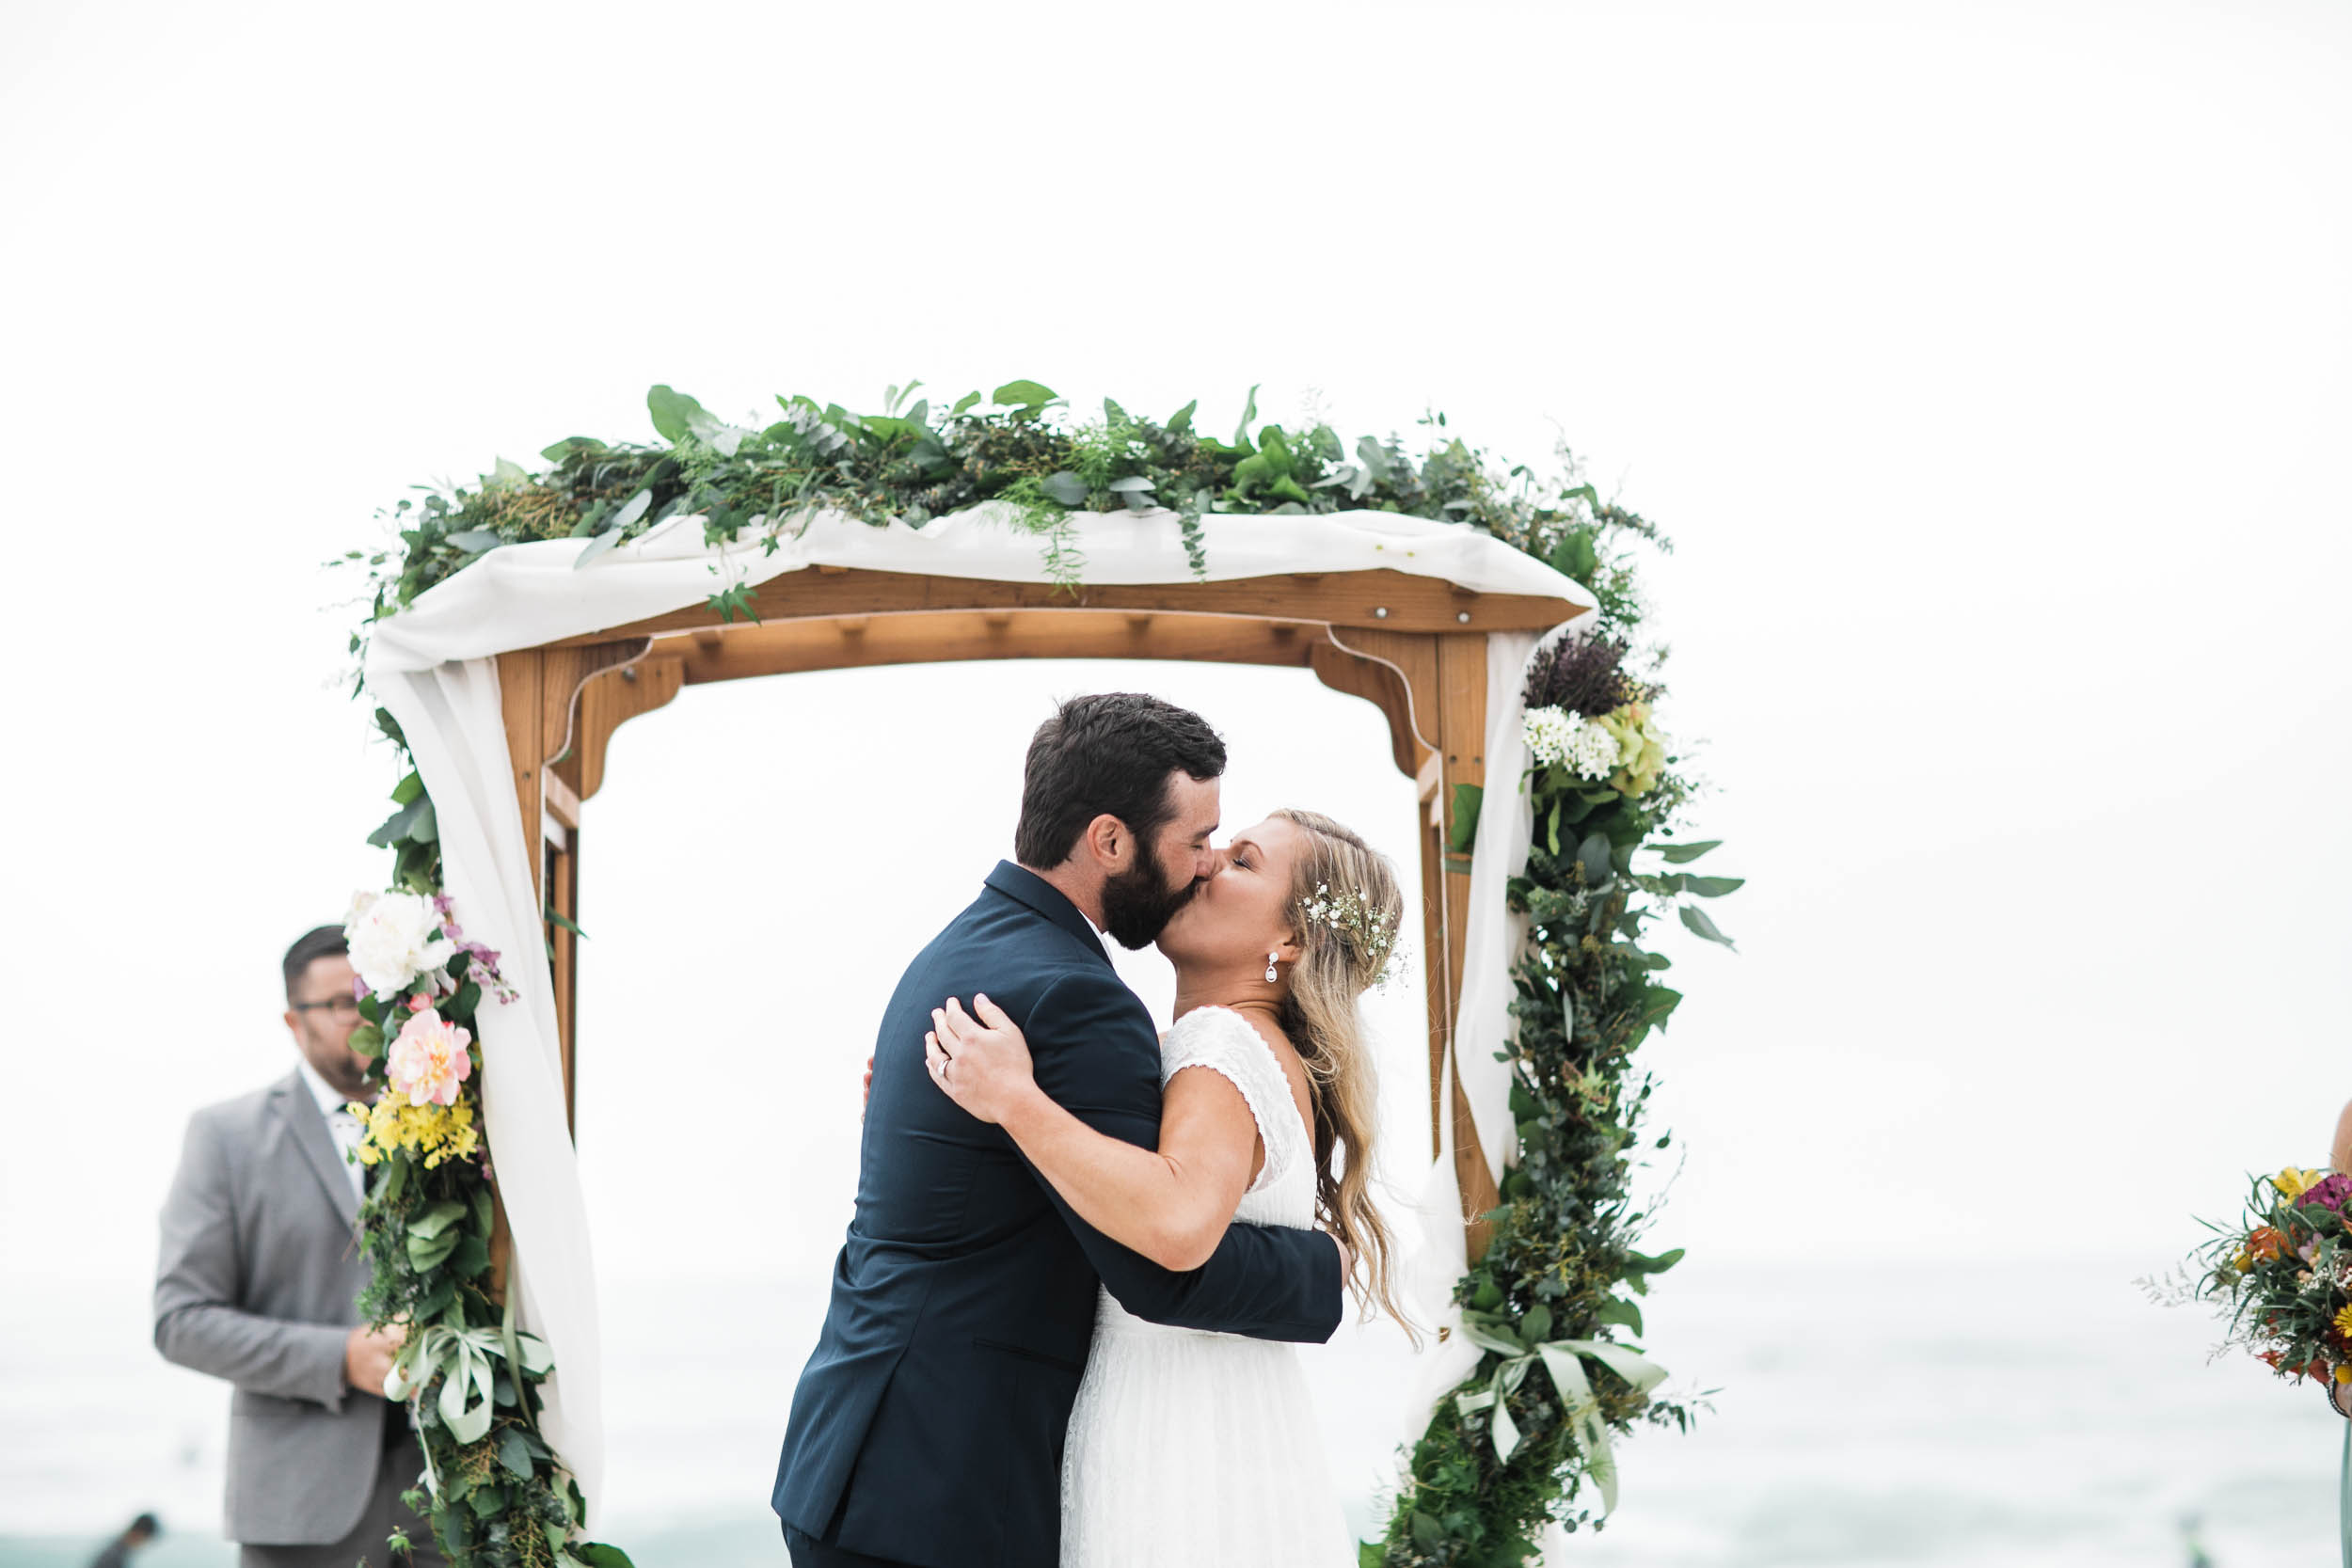 082617_C+K_Asilomar Pacific Grove Wedding_Buena Lane Photography_2549ER.jpg